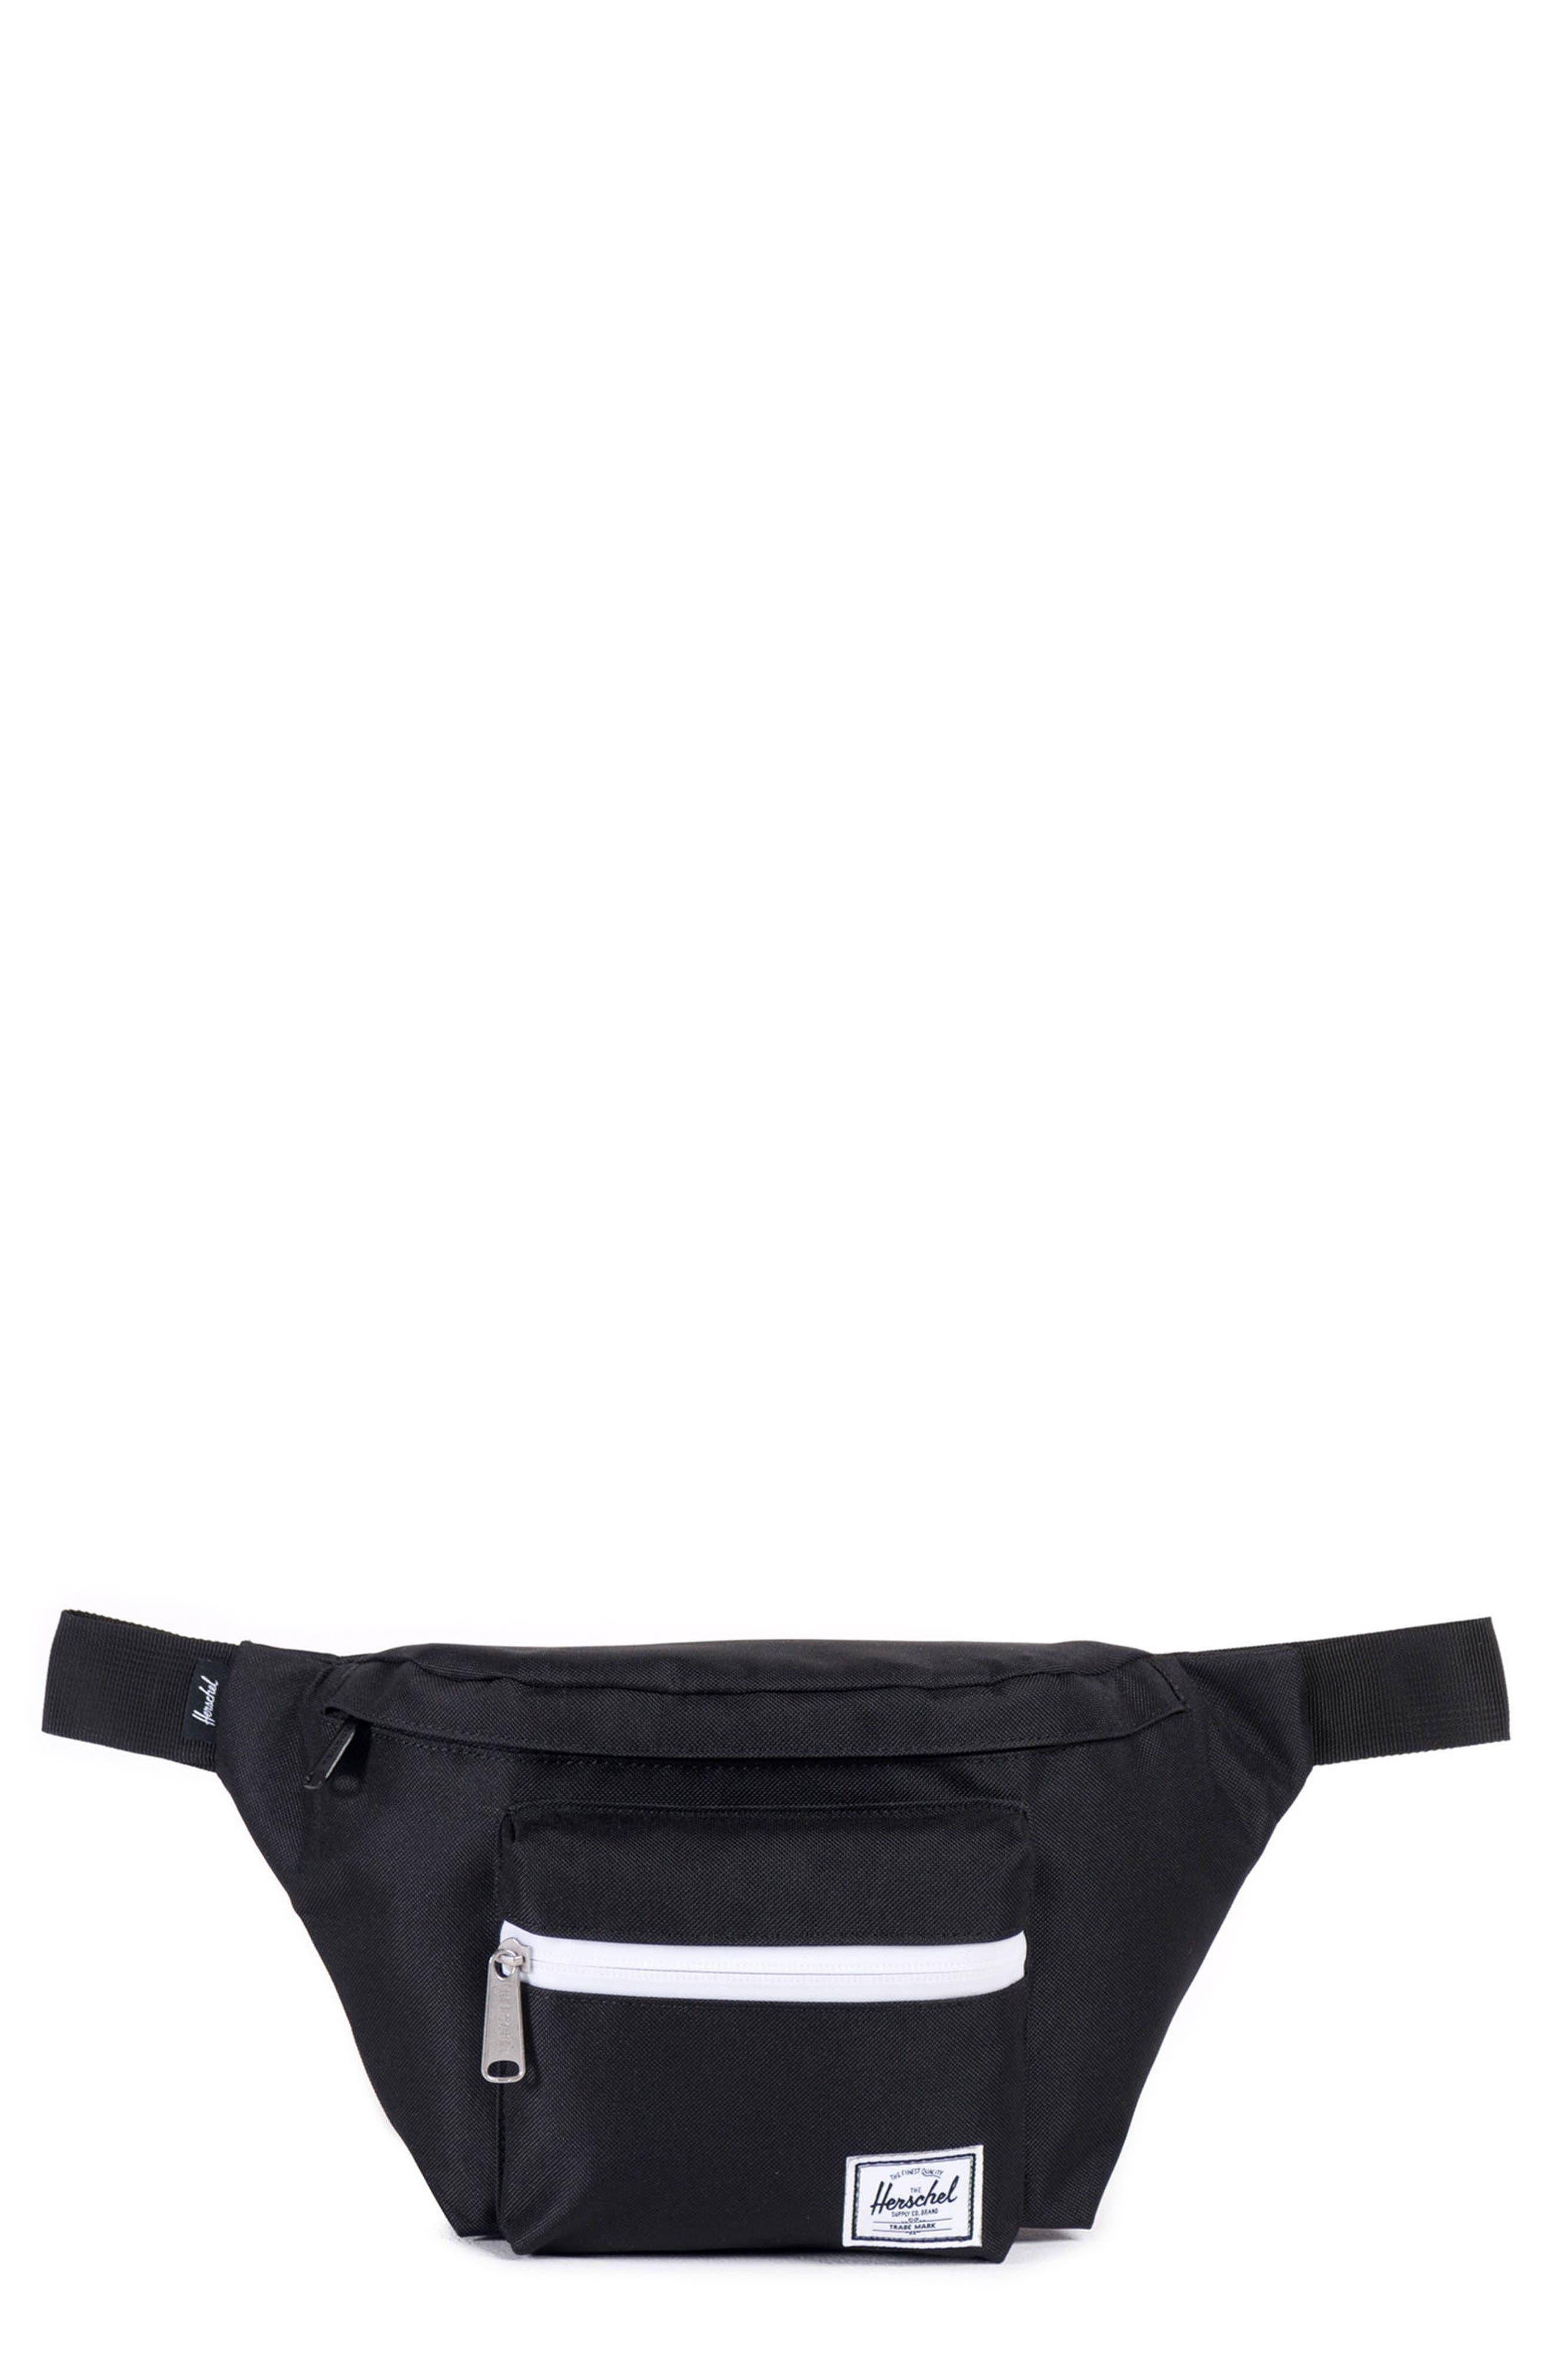 'Seventeen' Belt Bag,                             Main thumbnail 1, color,                             Black